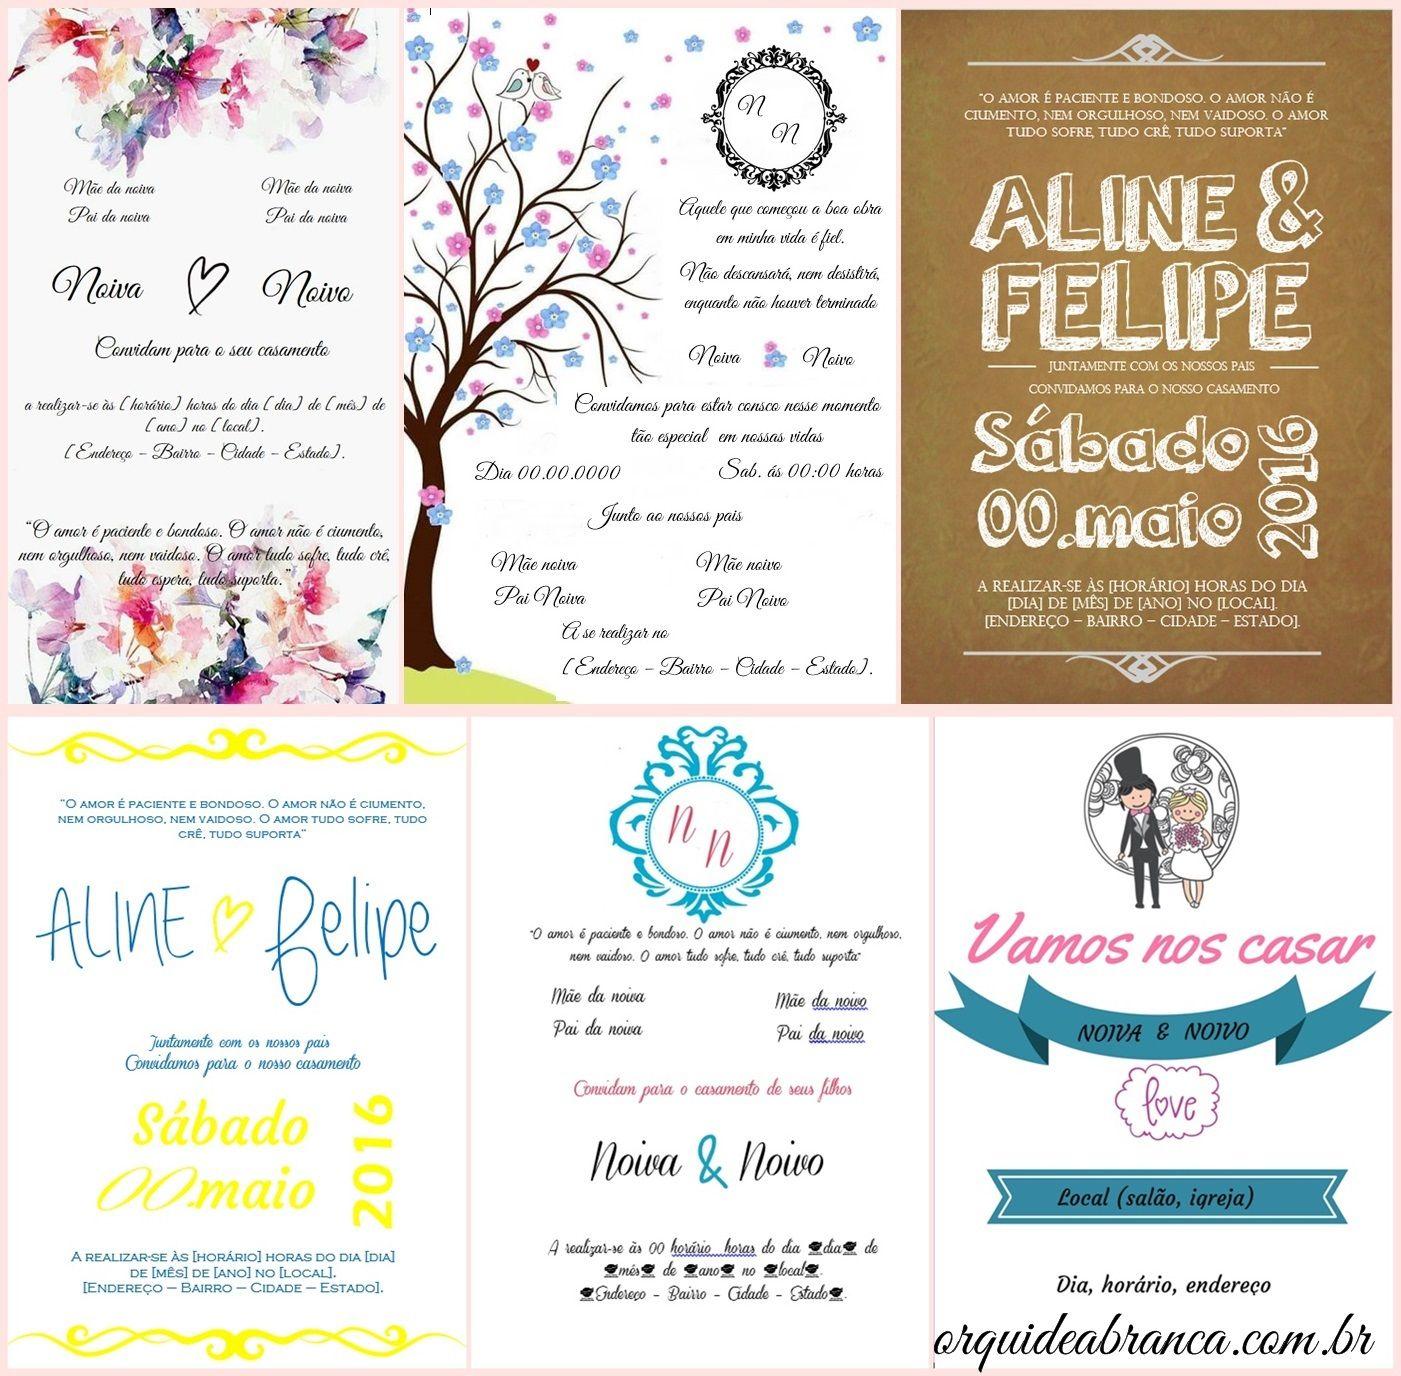 So 13 modelos de convites de casamento editveis diferentes todos invitations lyrics so 13 modelos de convites de casamento editveis diferentes todos feitos por mim e stopboris Image collections